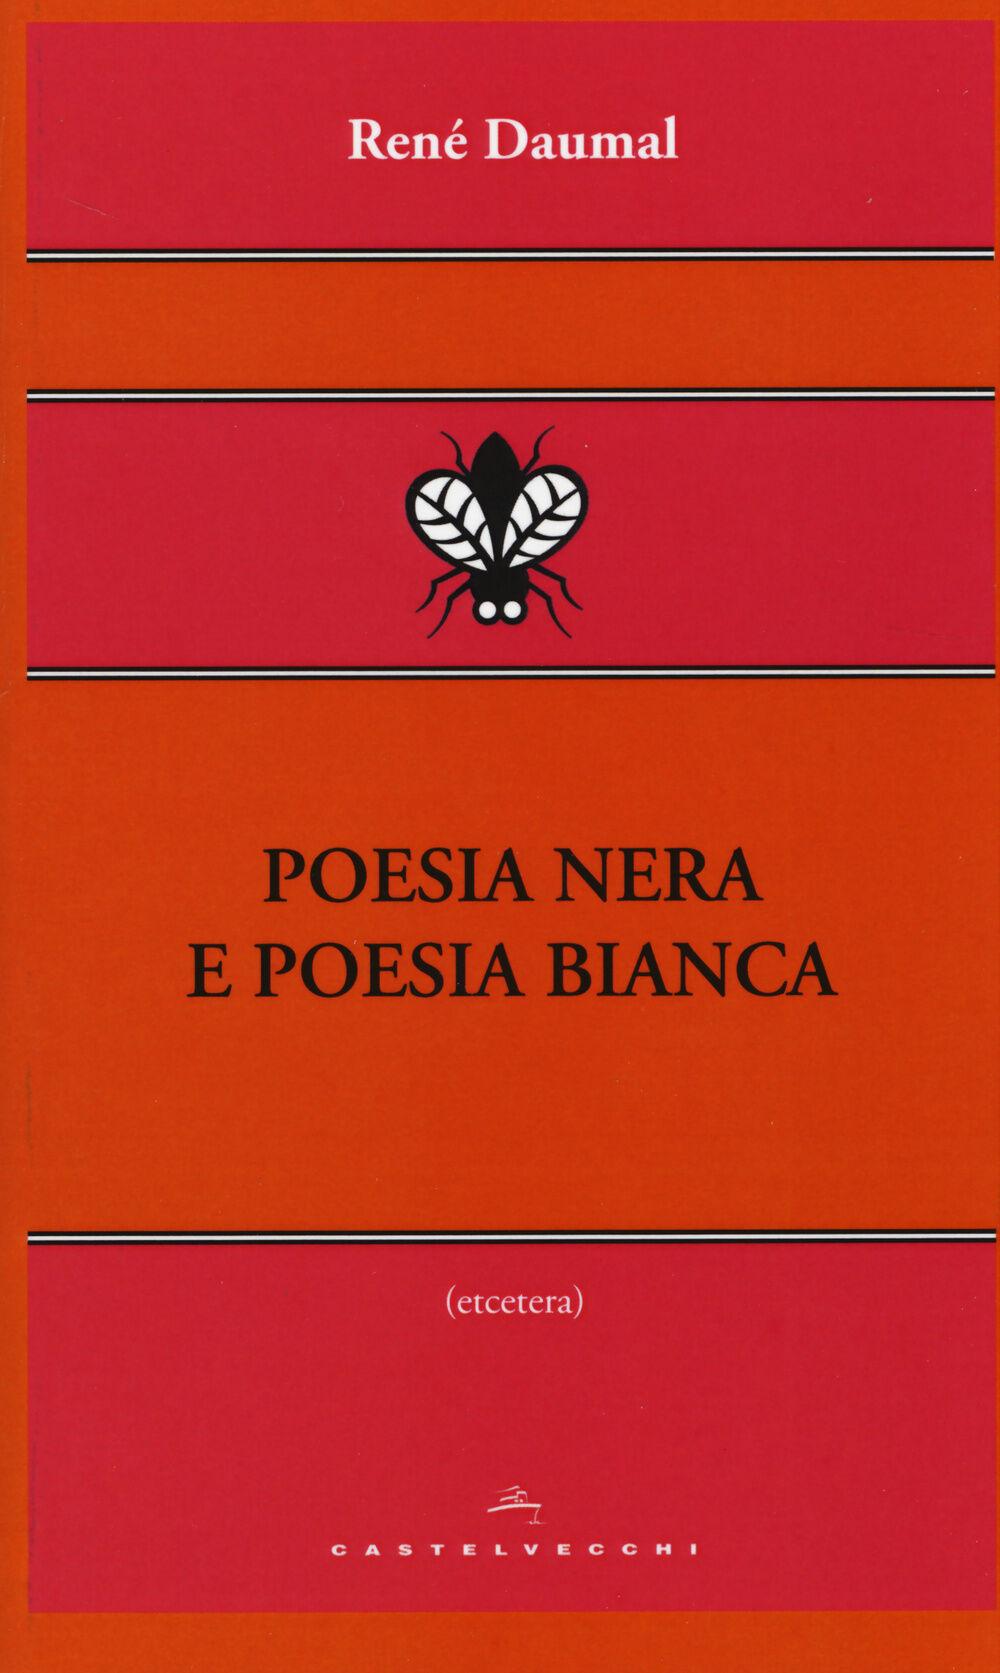 Poesia nera e poesia bianca